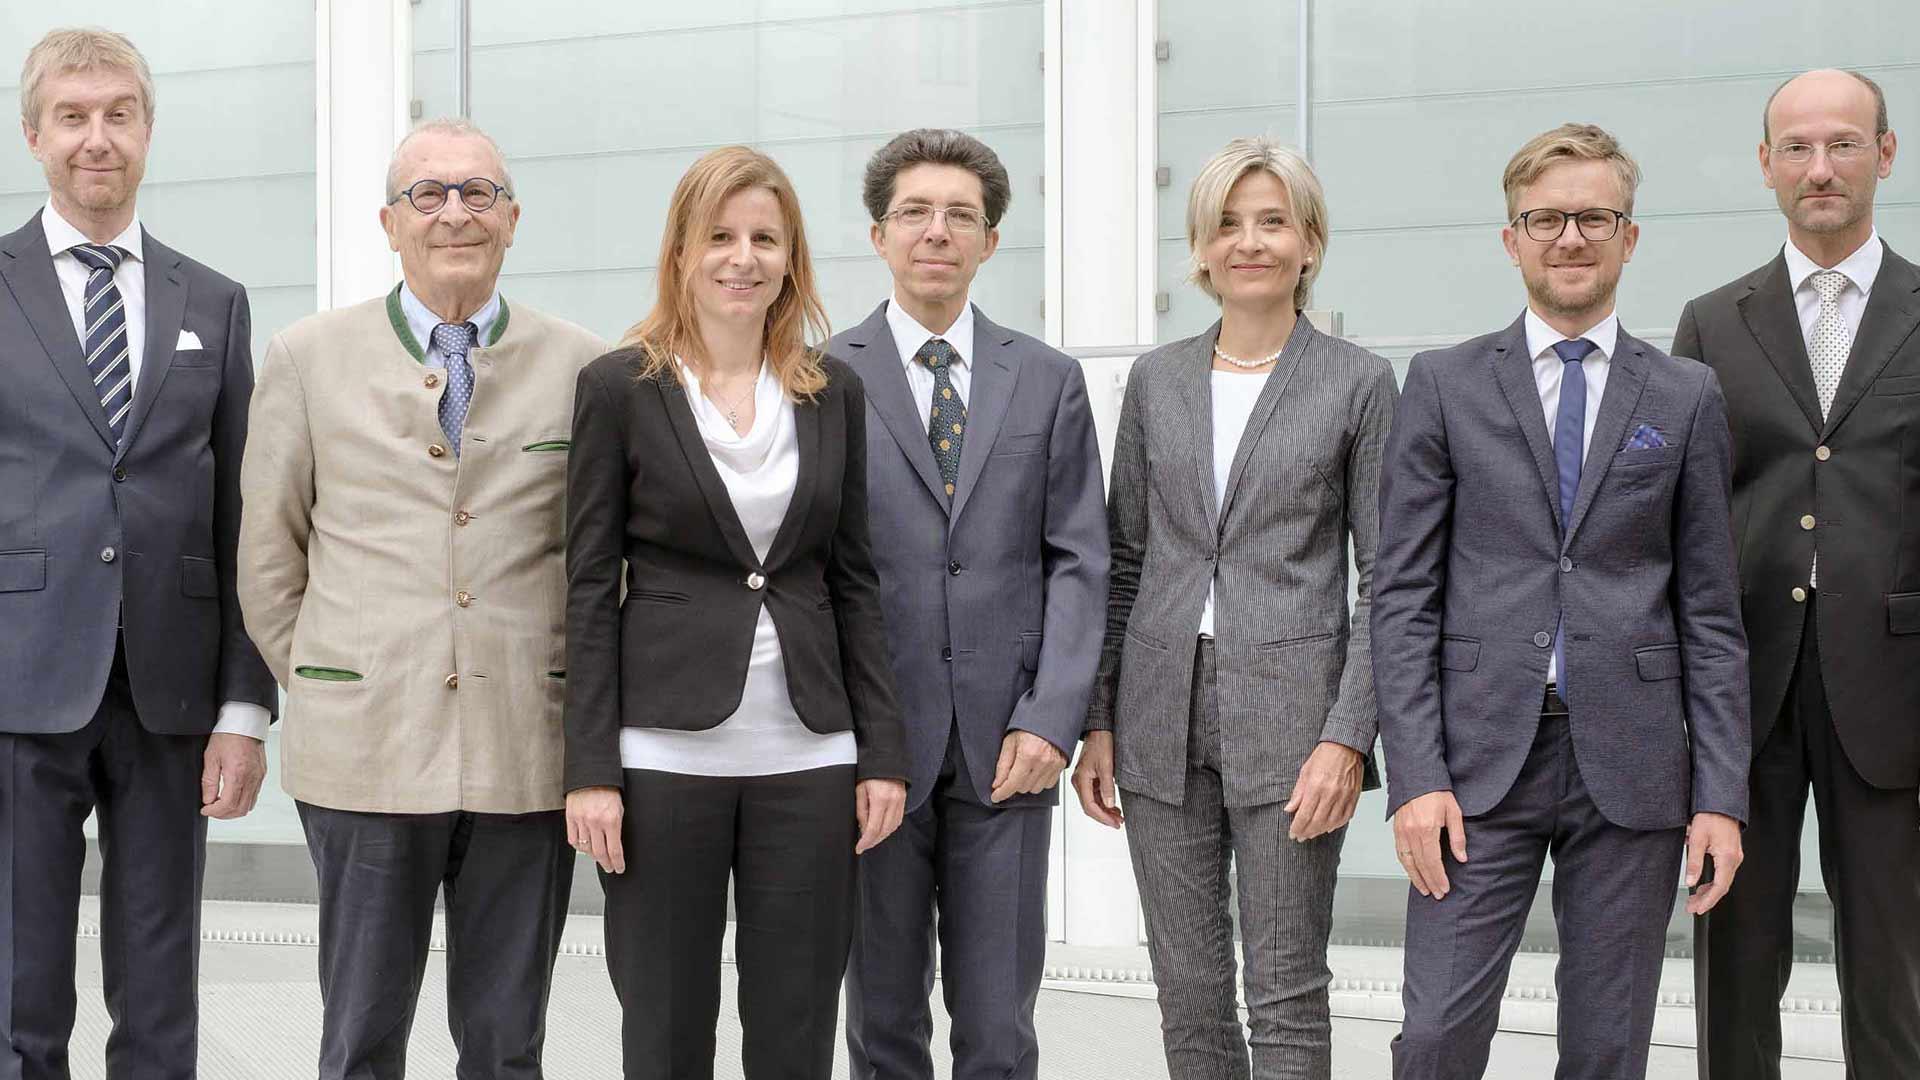 Anwaltskanzlei Studio Legale Pobitzer